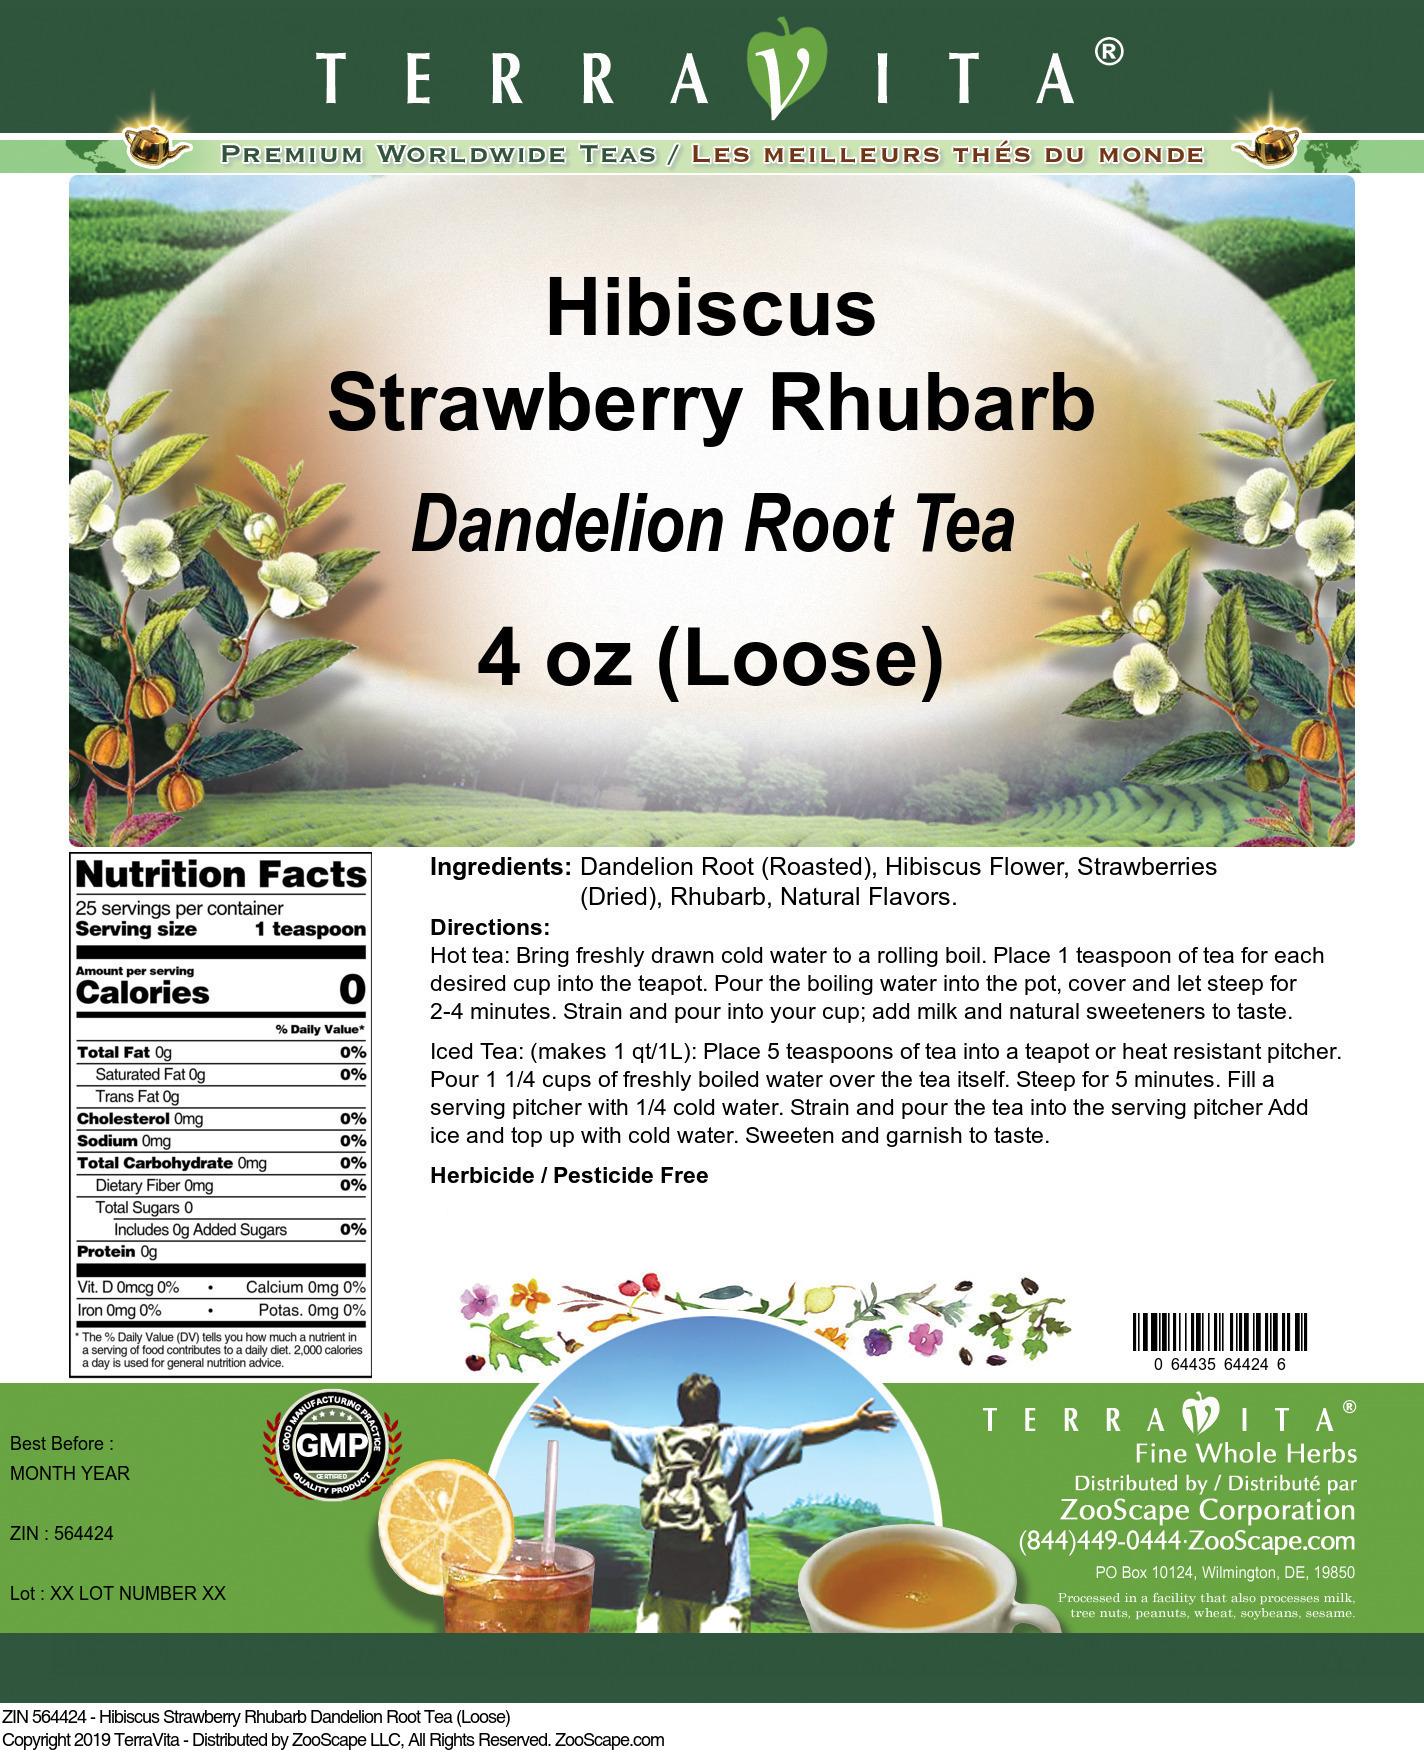 Hibiscus Strawberry Rhubarb Dandelion Root